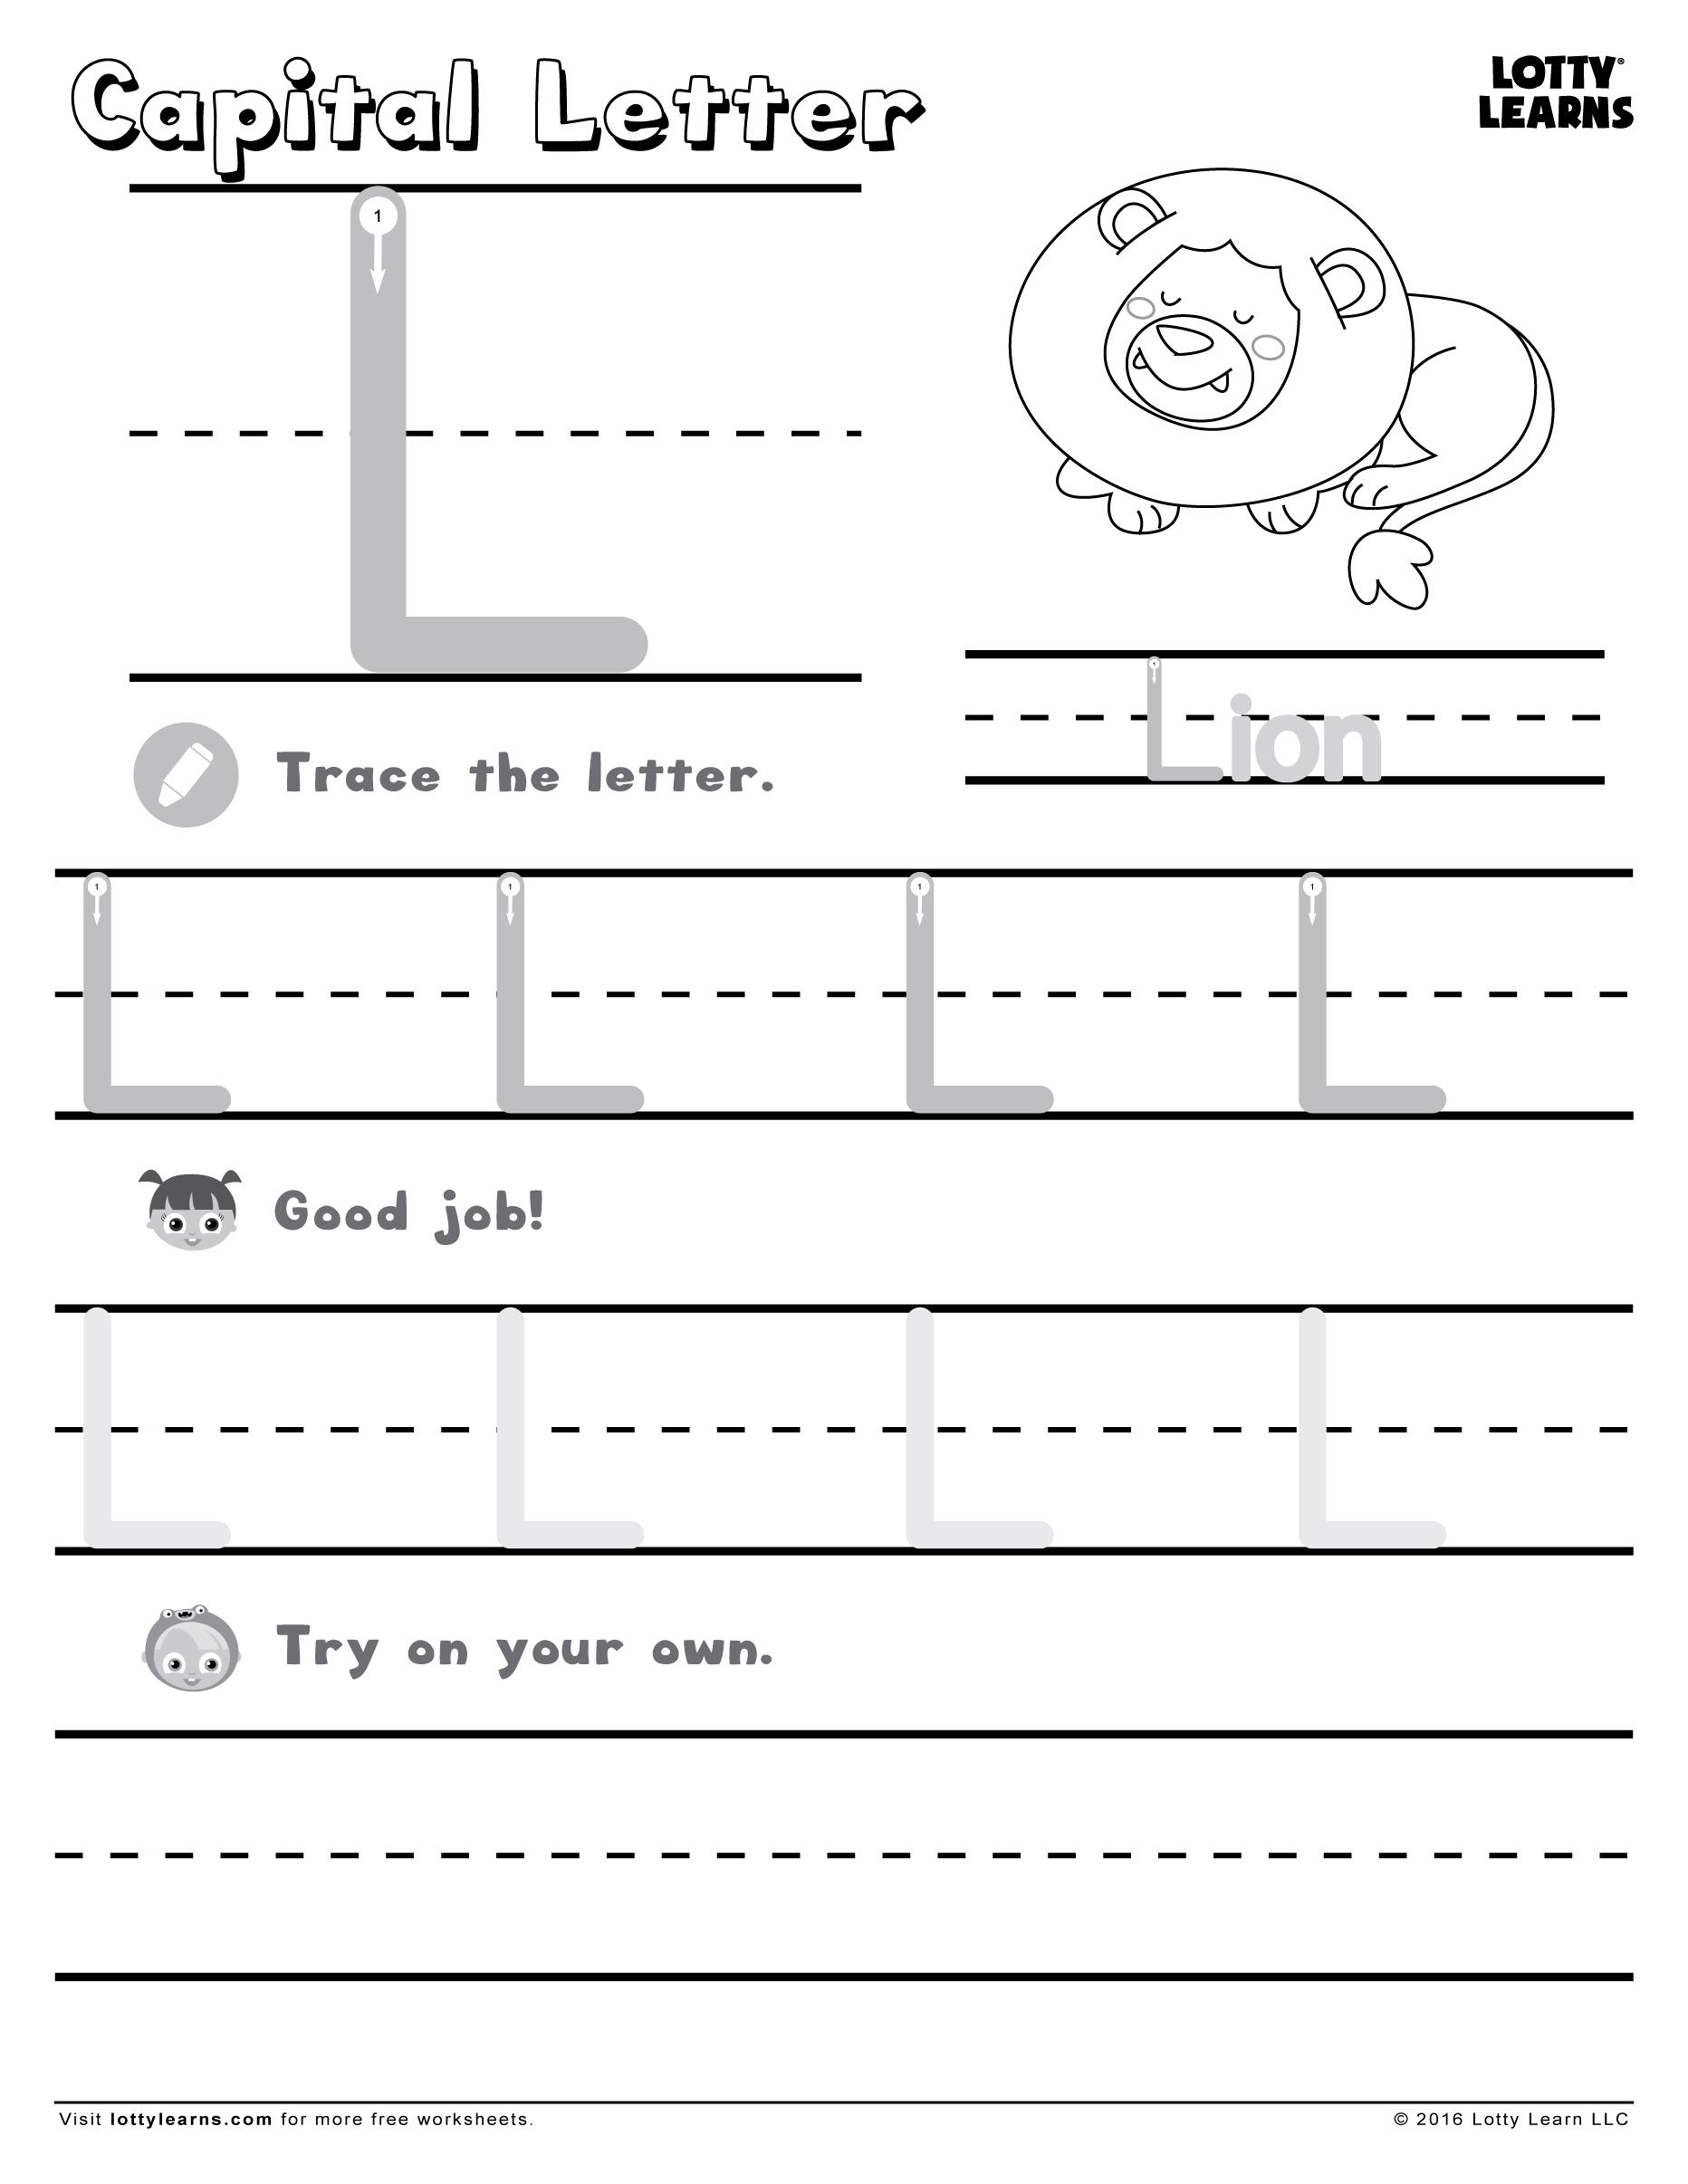 Capital Letter L | Lotty Learns | Lower Case Letters inside Letter L Worksheets For Preschool